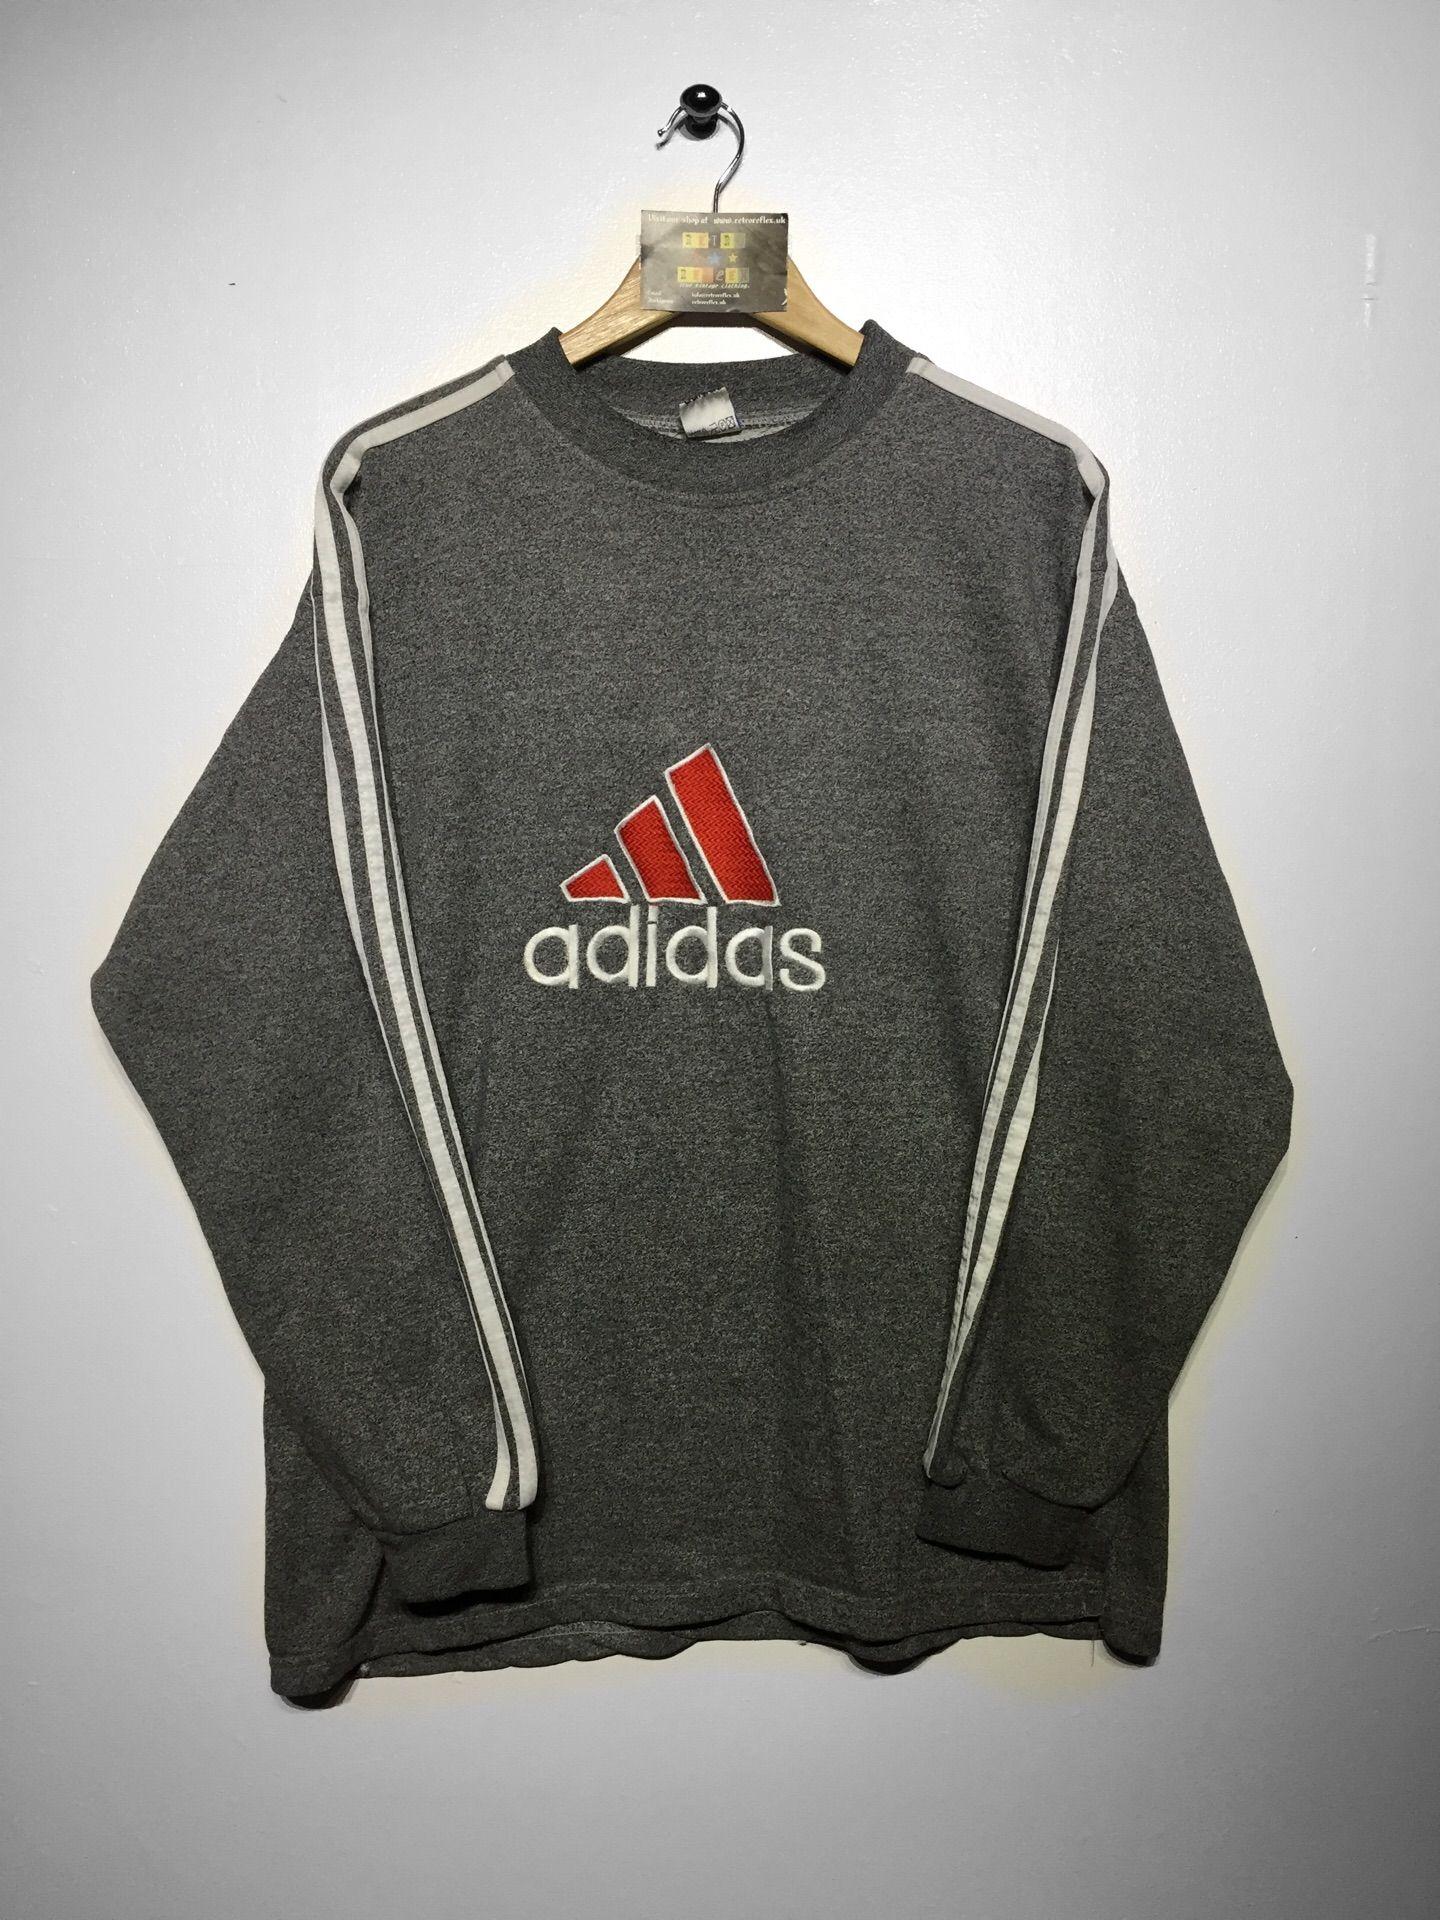 Retro Reflex - home to vintage and retro designer clothing. Adidas  sweatshirt ...